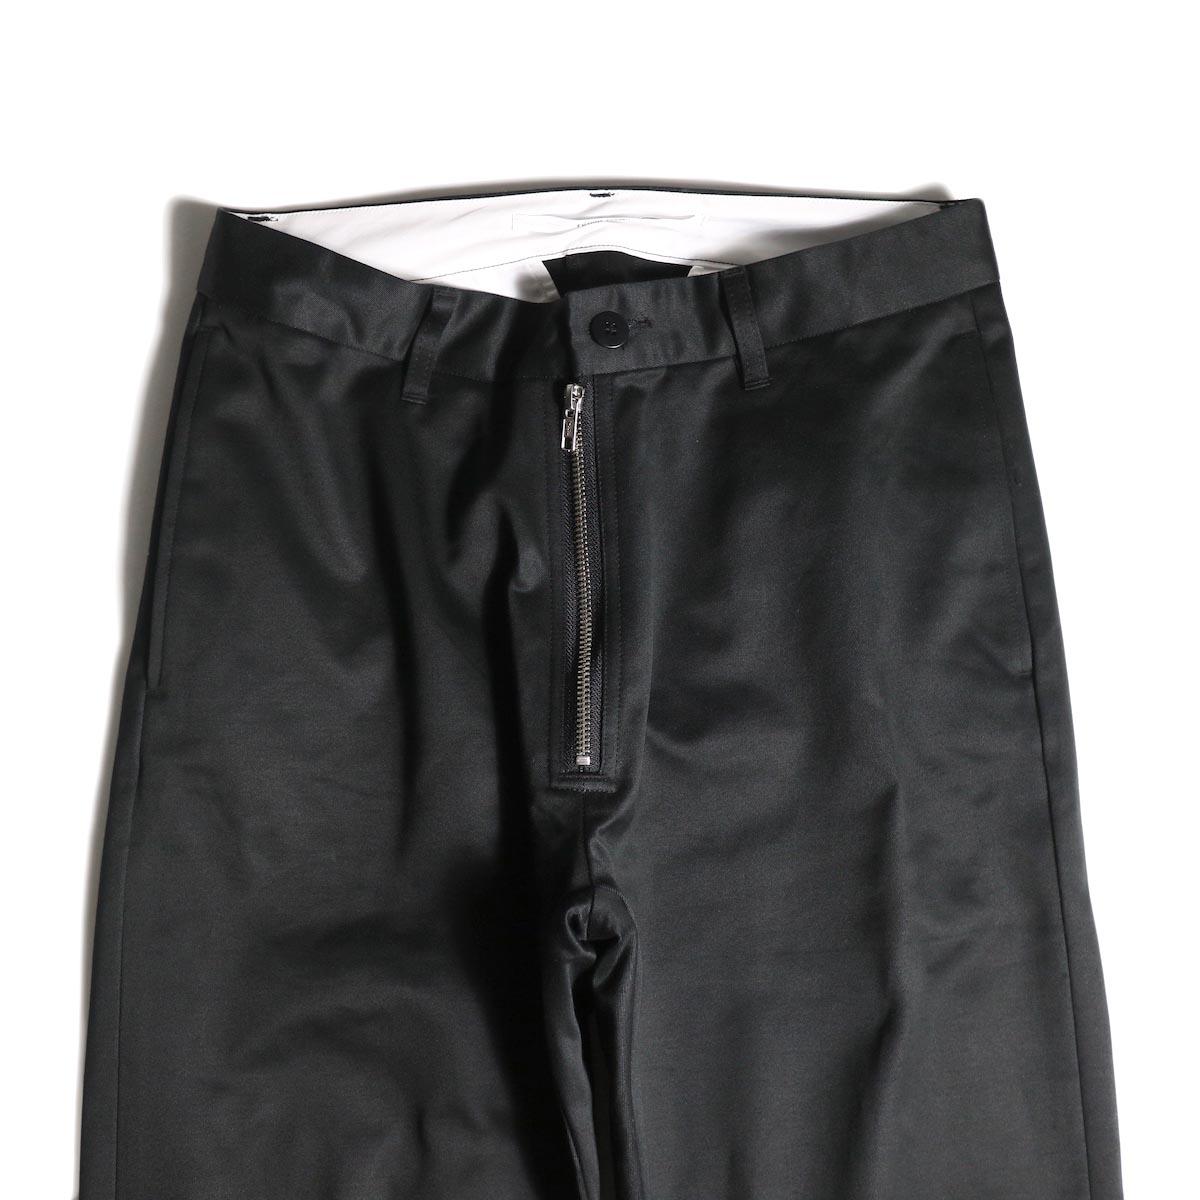 FUTURE PRIMITIVE / FP FZ CHINO PANTS (Black)ウエスト